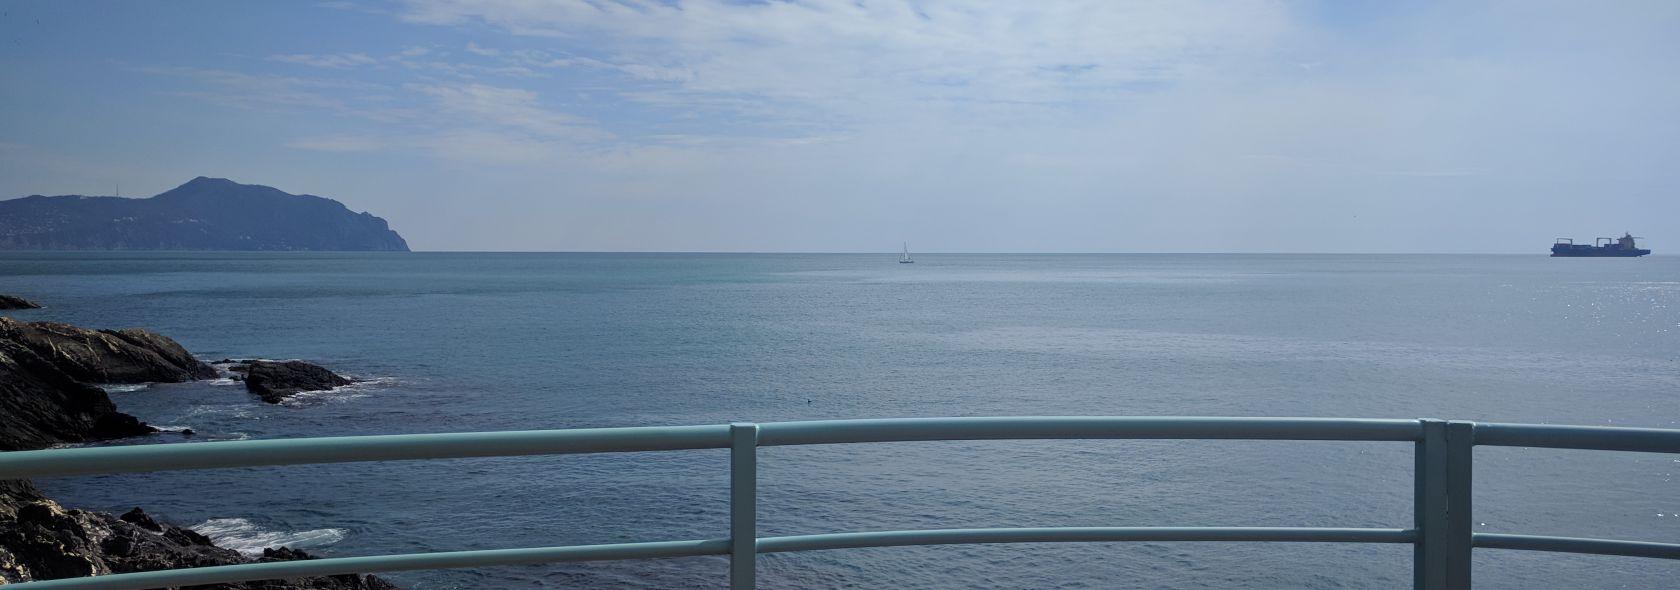 Nervi - sea and the Portofino promontory